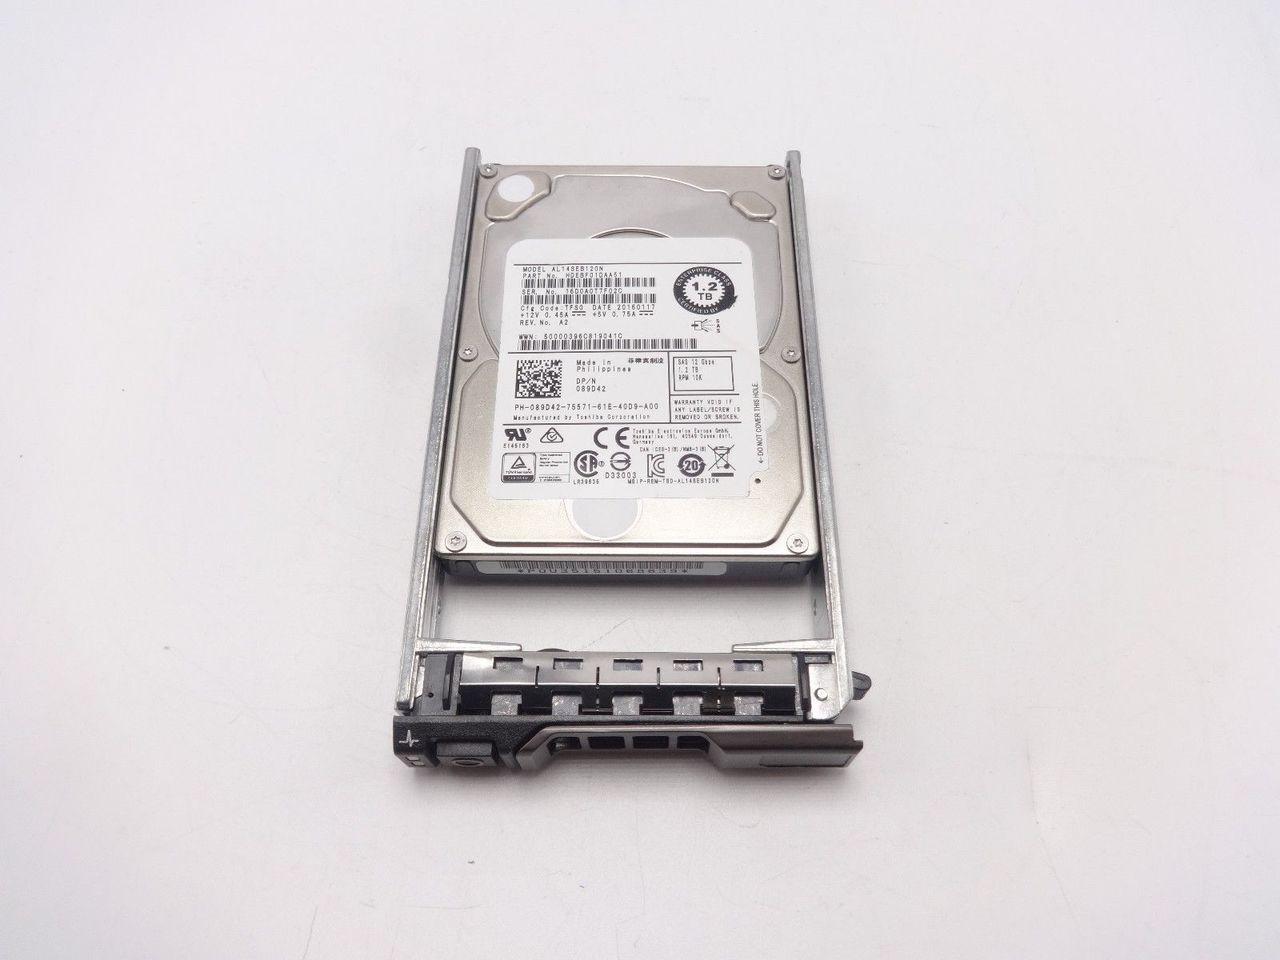 DELL 89D42 1.2TB 10K 12GBPS SAS 2.5 Hard Drive HDEBF01DAA51